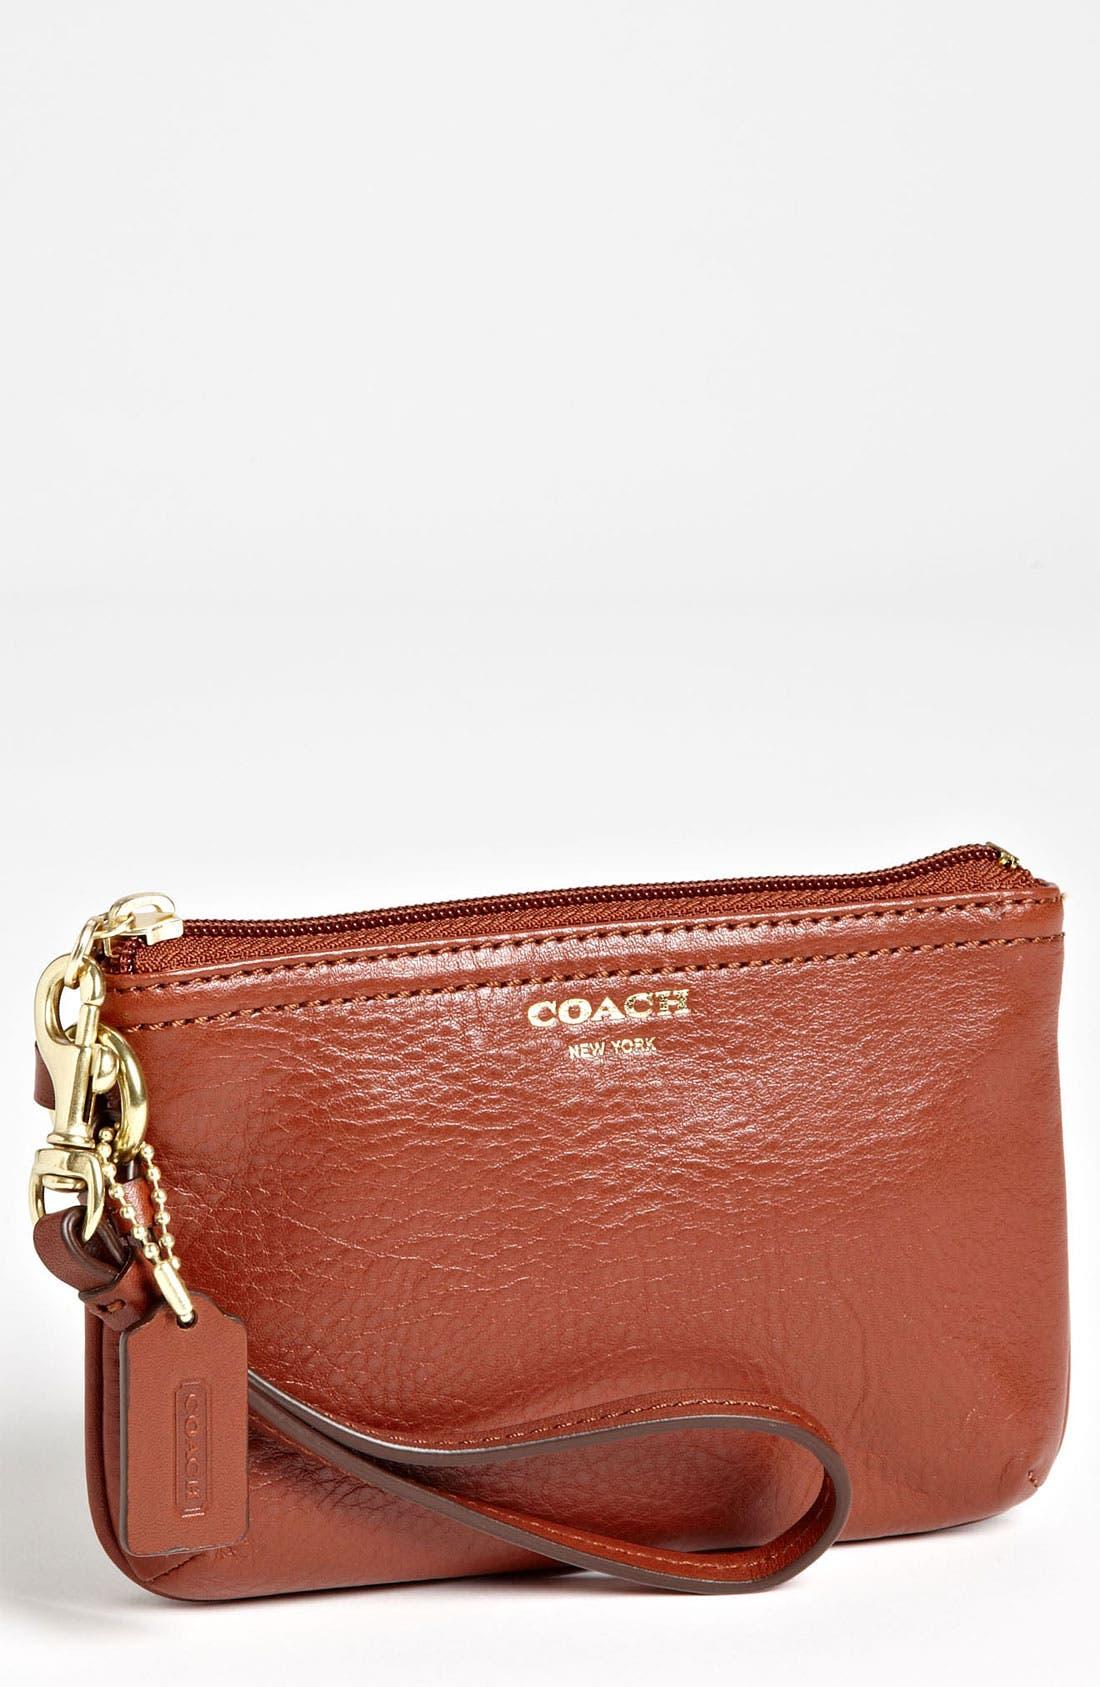 Main Image - COACH 'Small' Leather Wristlet